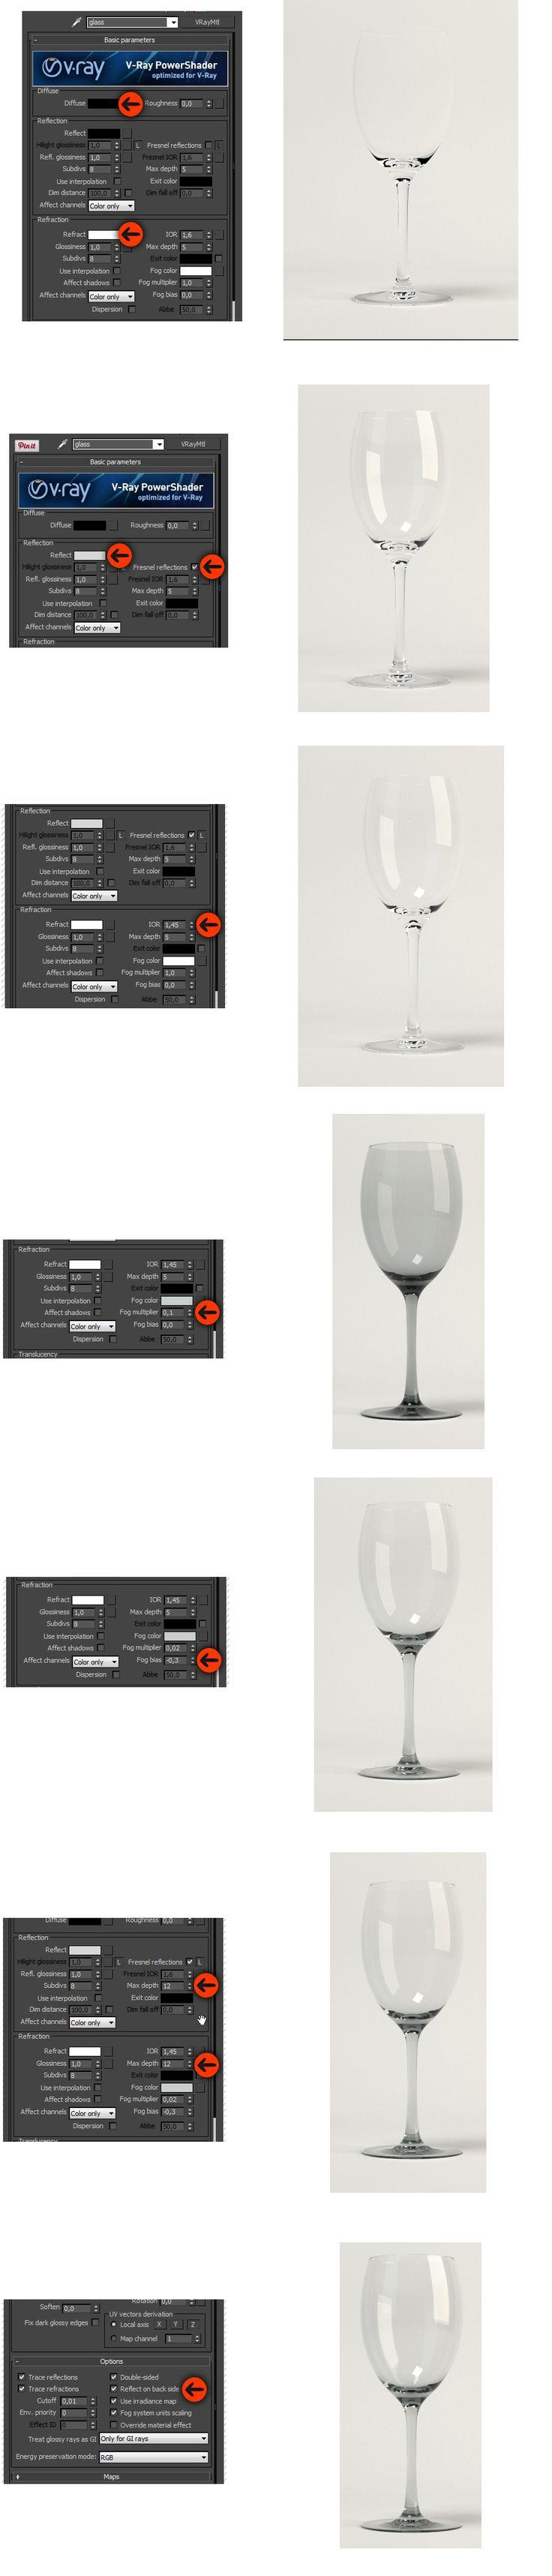 066797f67686c421a6864c648498f564.jpg (Image JPEG, 900×4200 pixels) - Redimensionnée (36%)